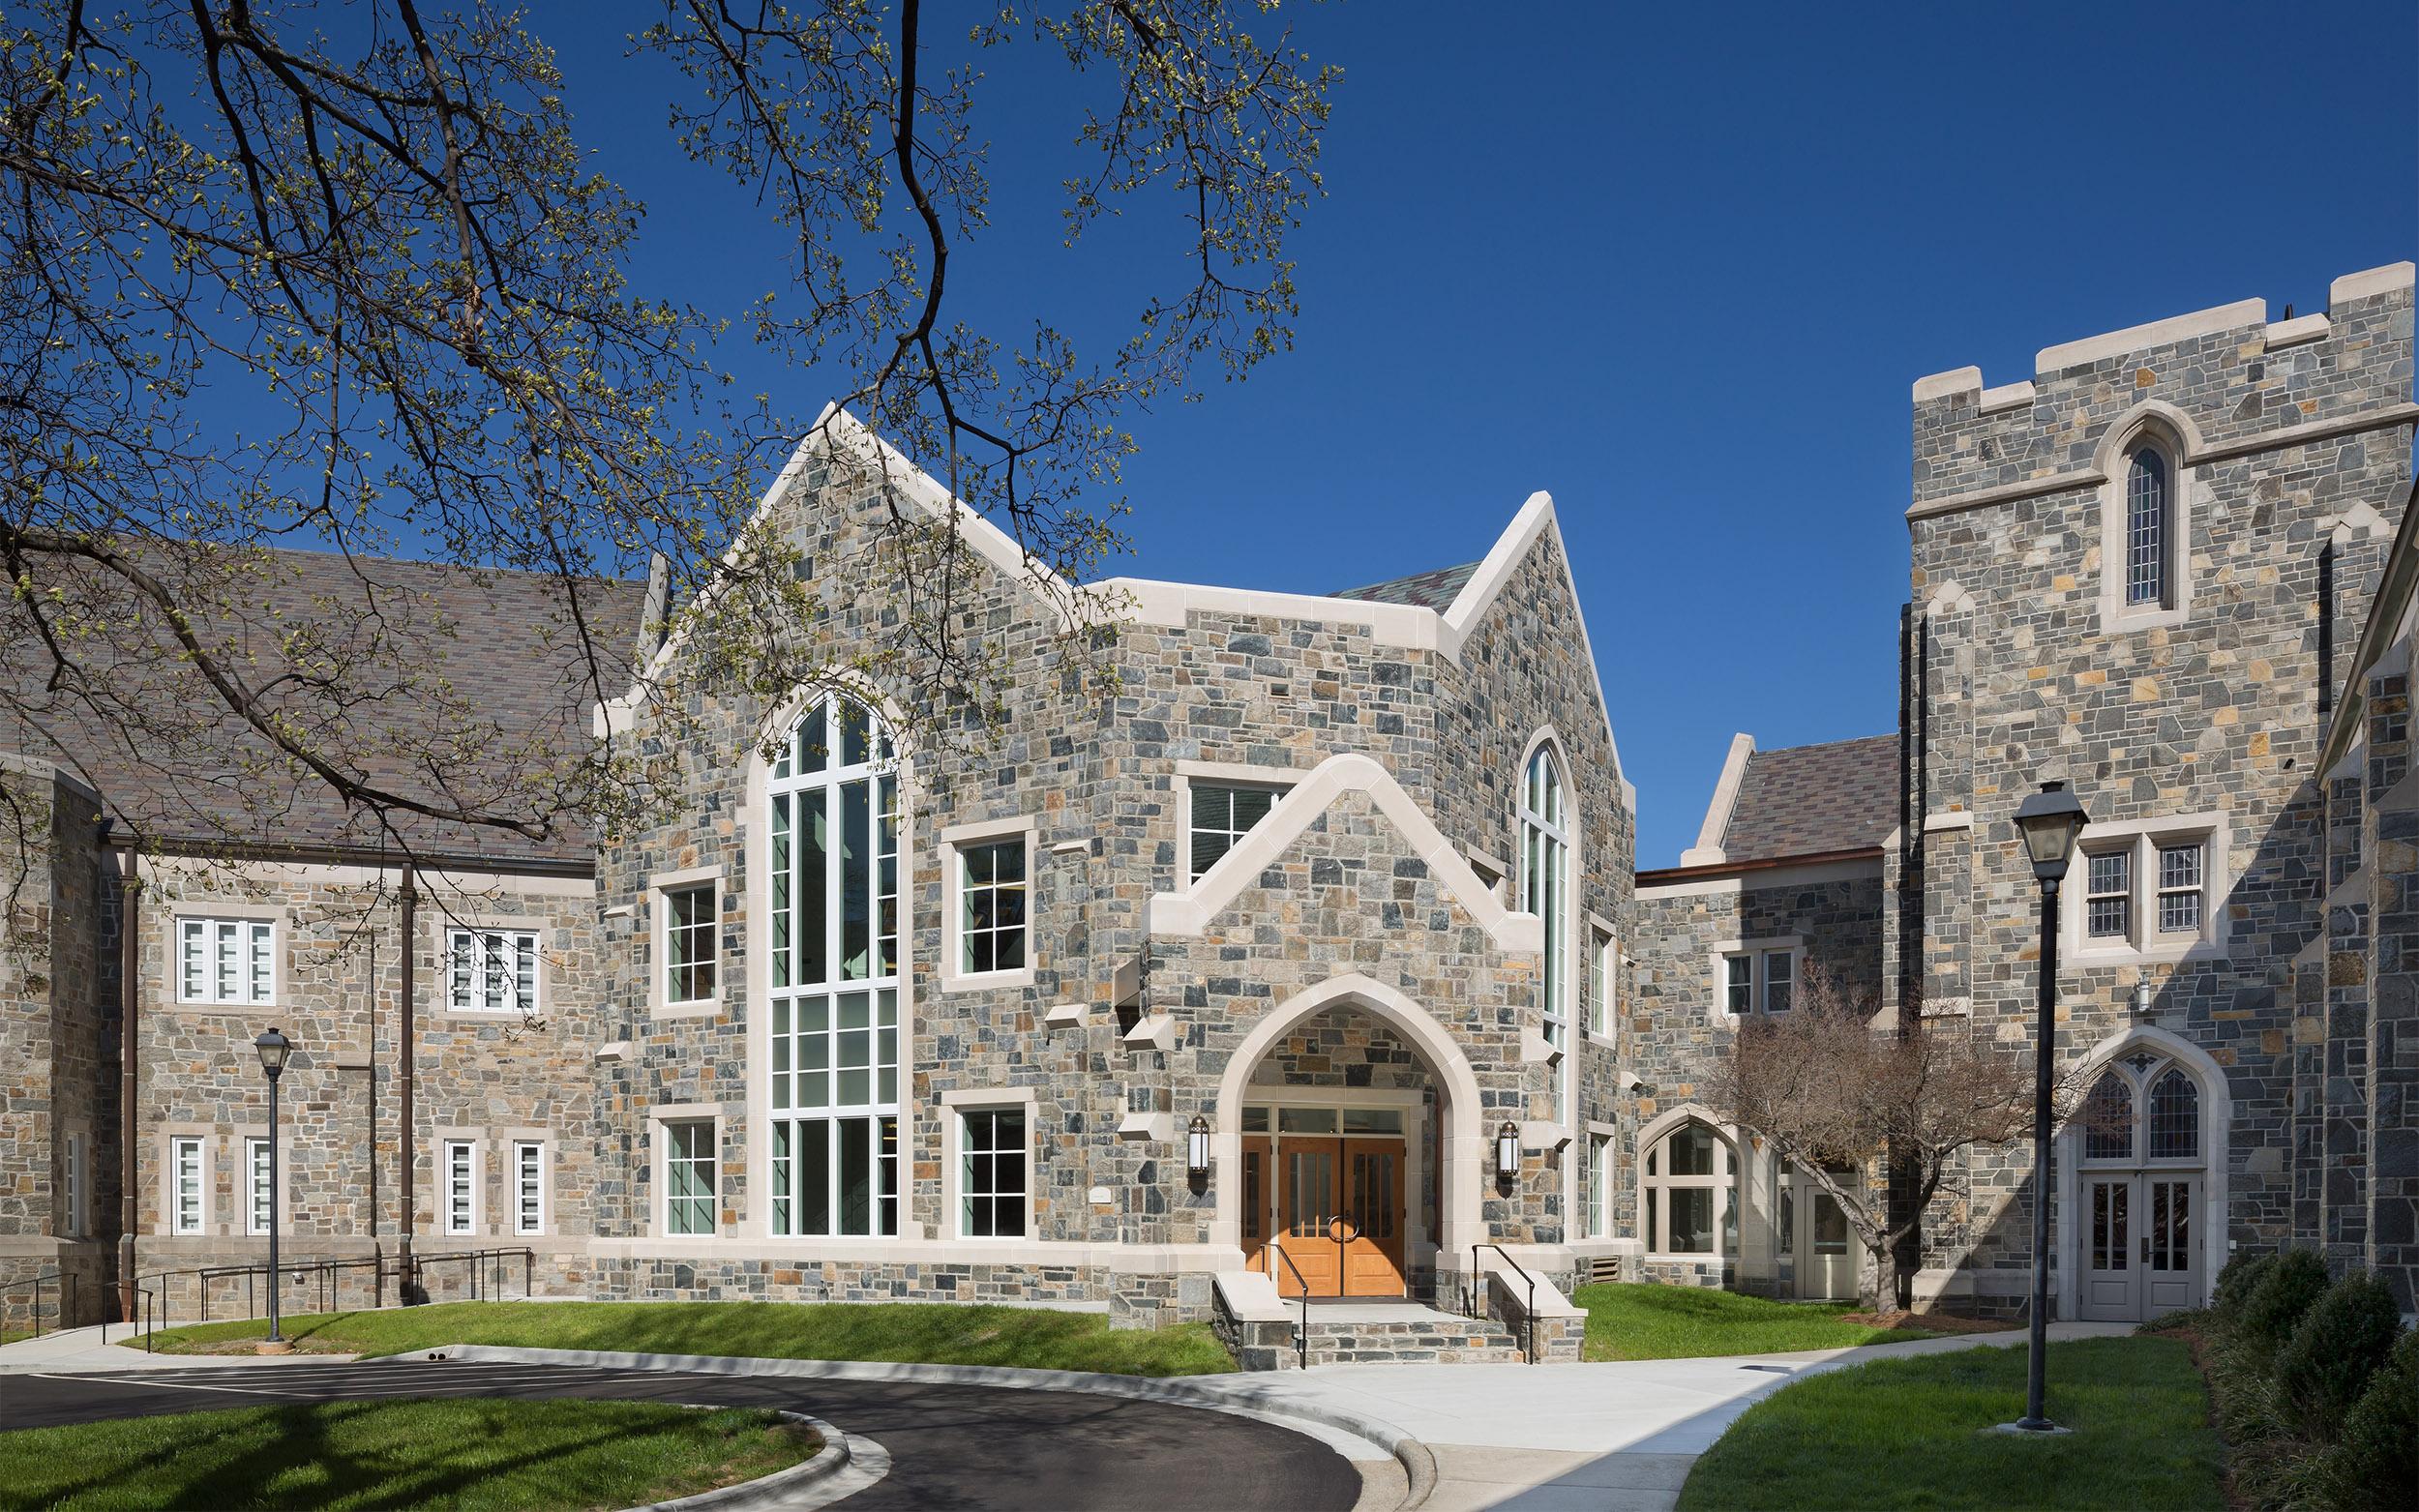 Myers Park Presbyterian Church